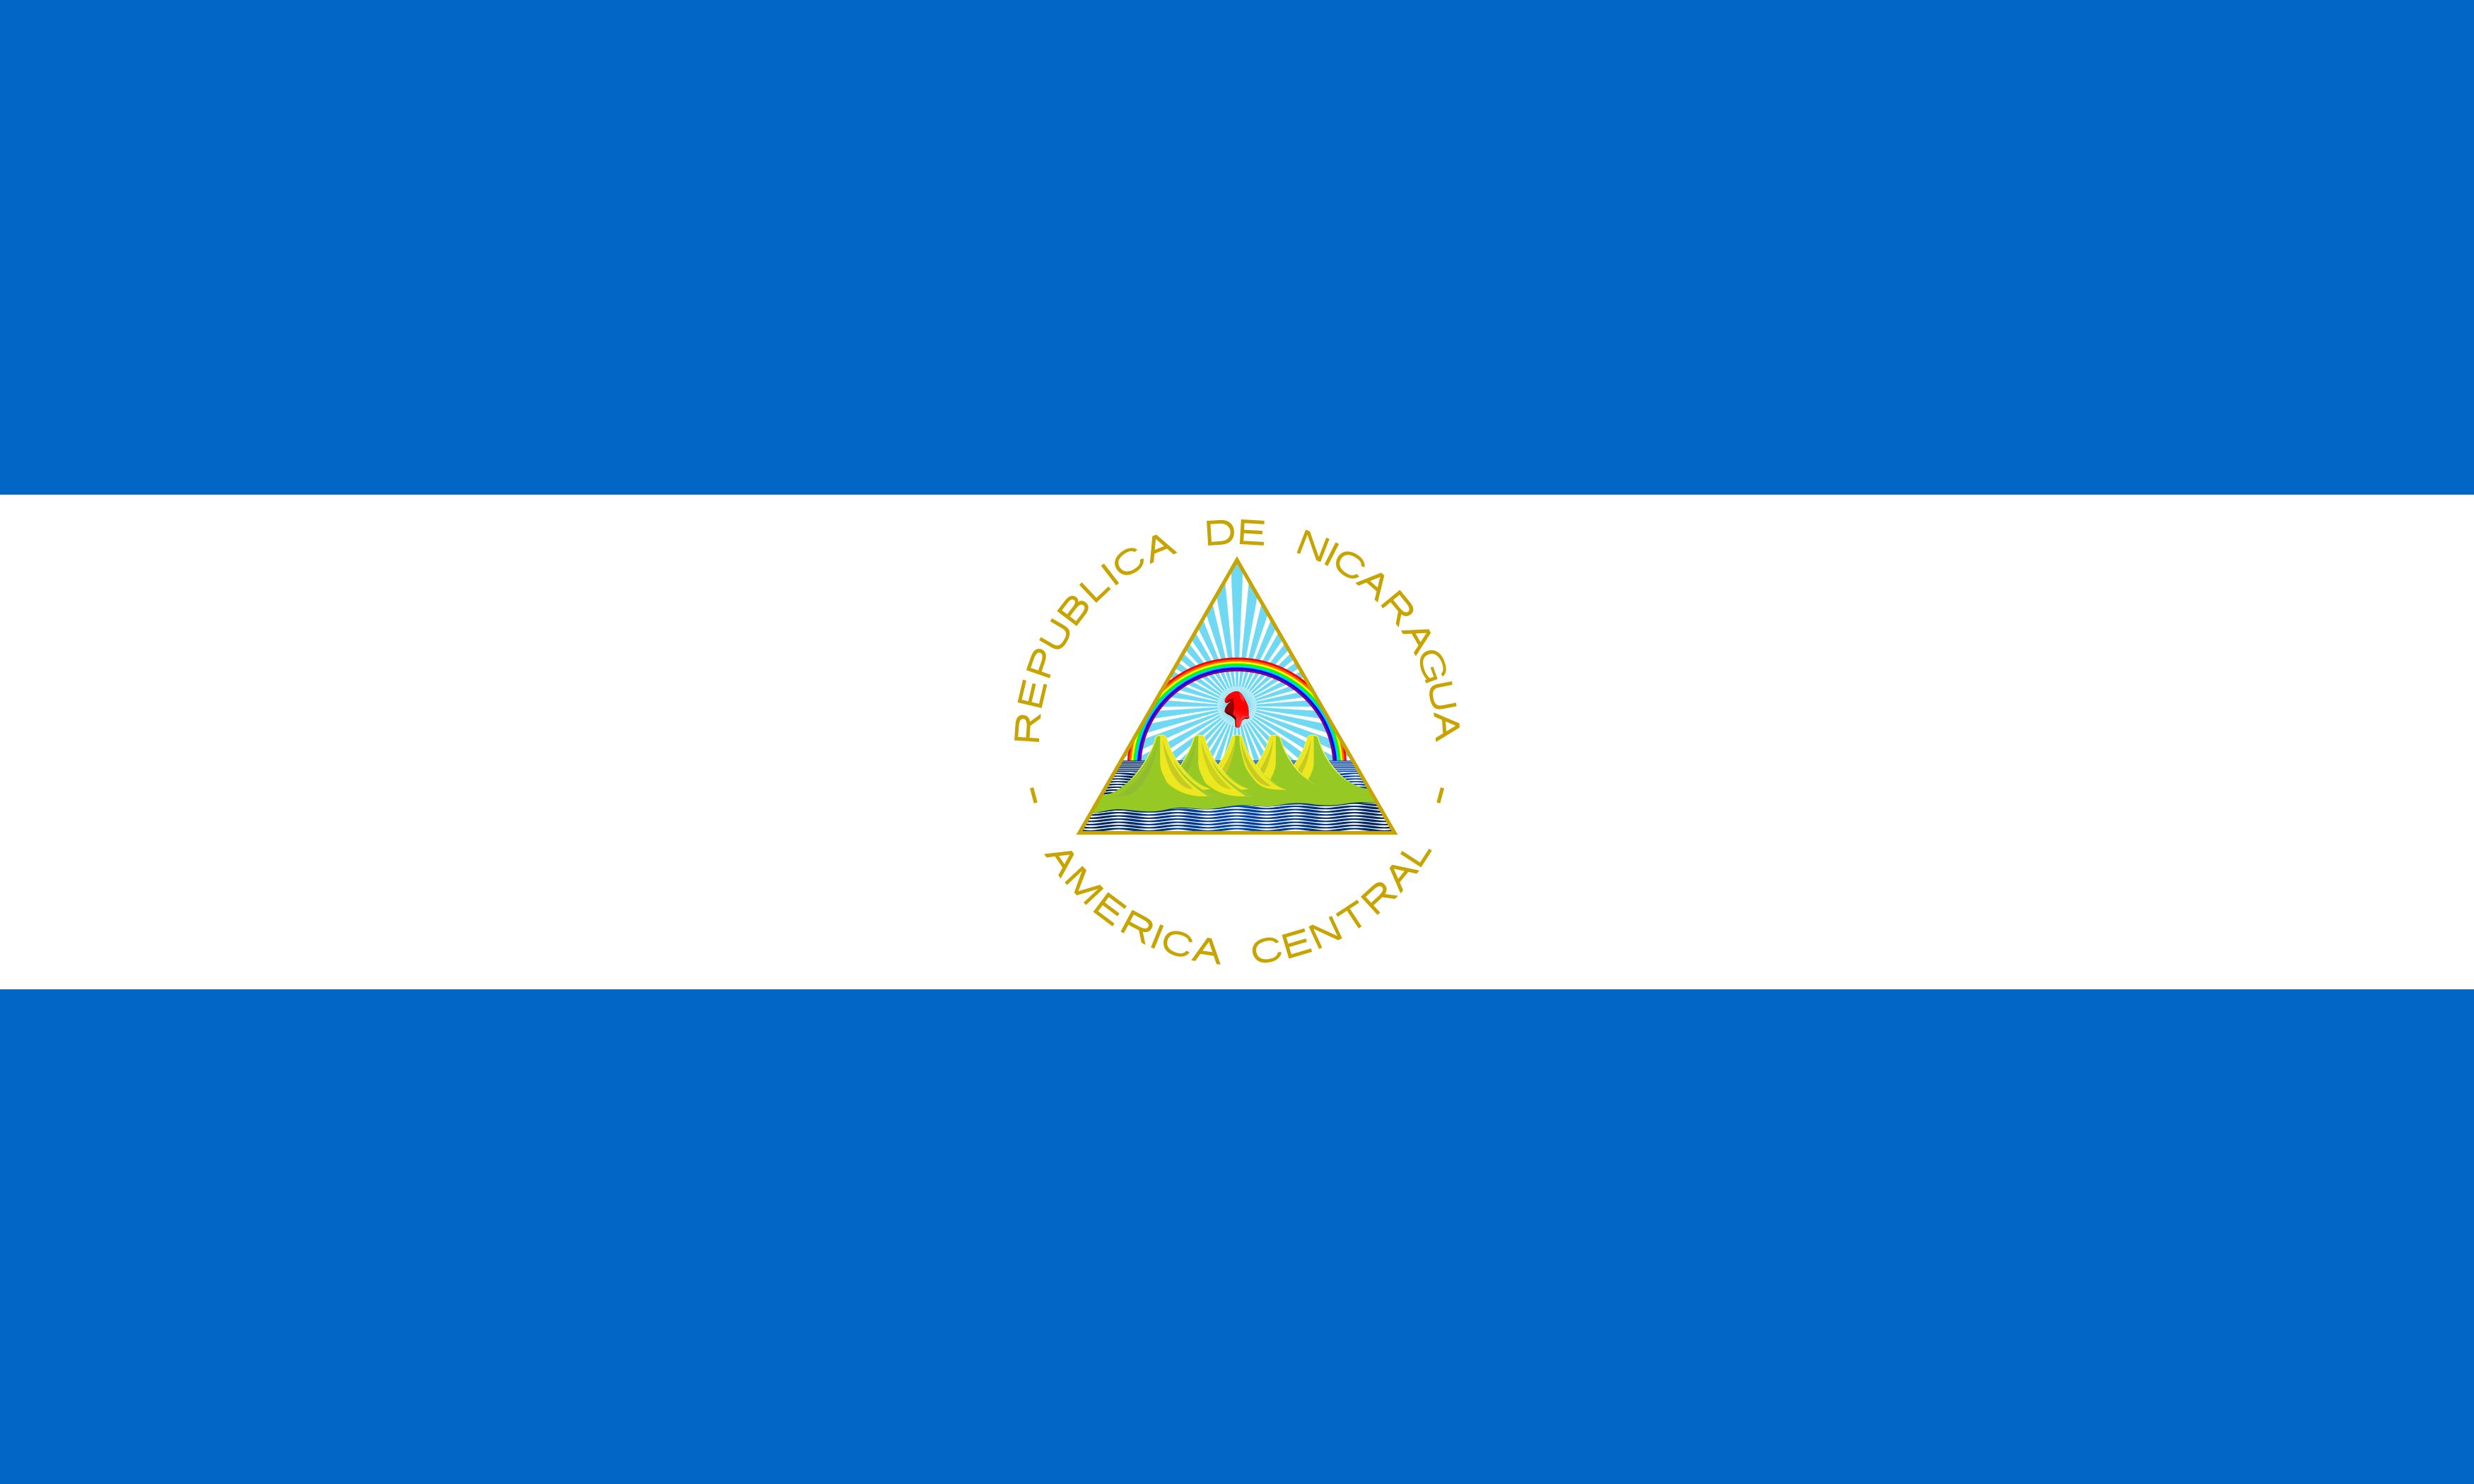 bandeira da nicaragua - Bandeira da Nicarágua